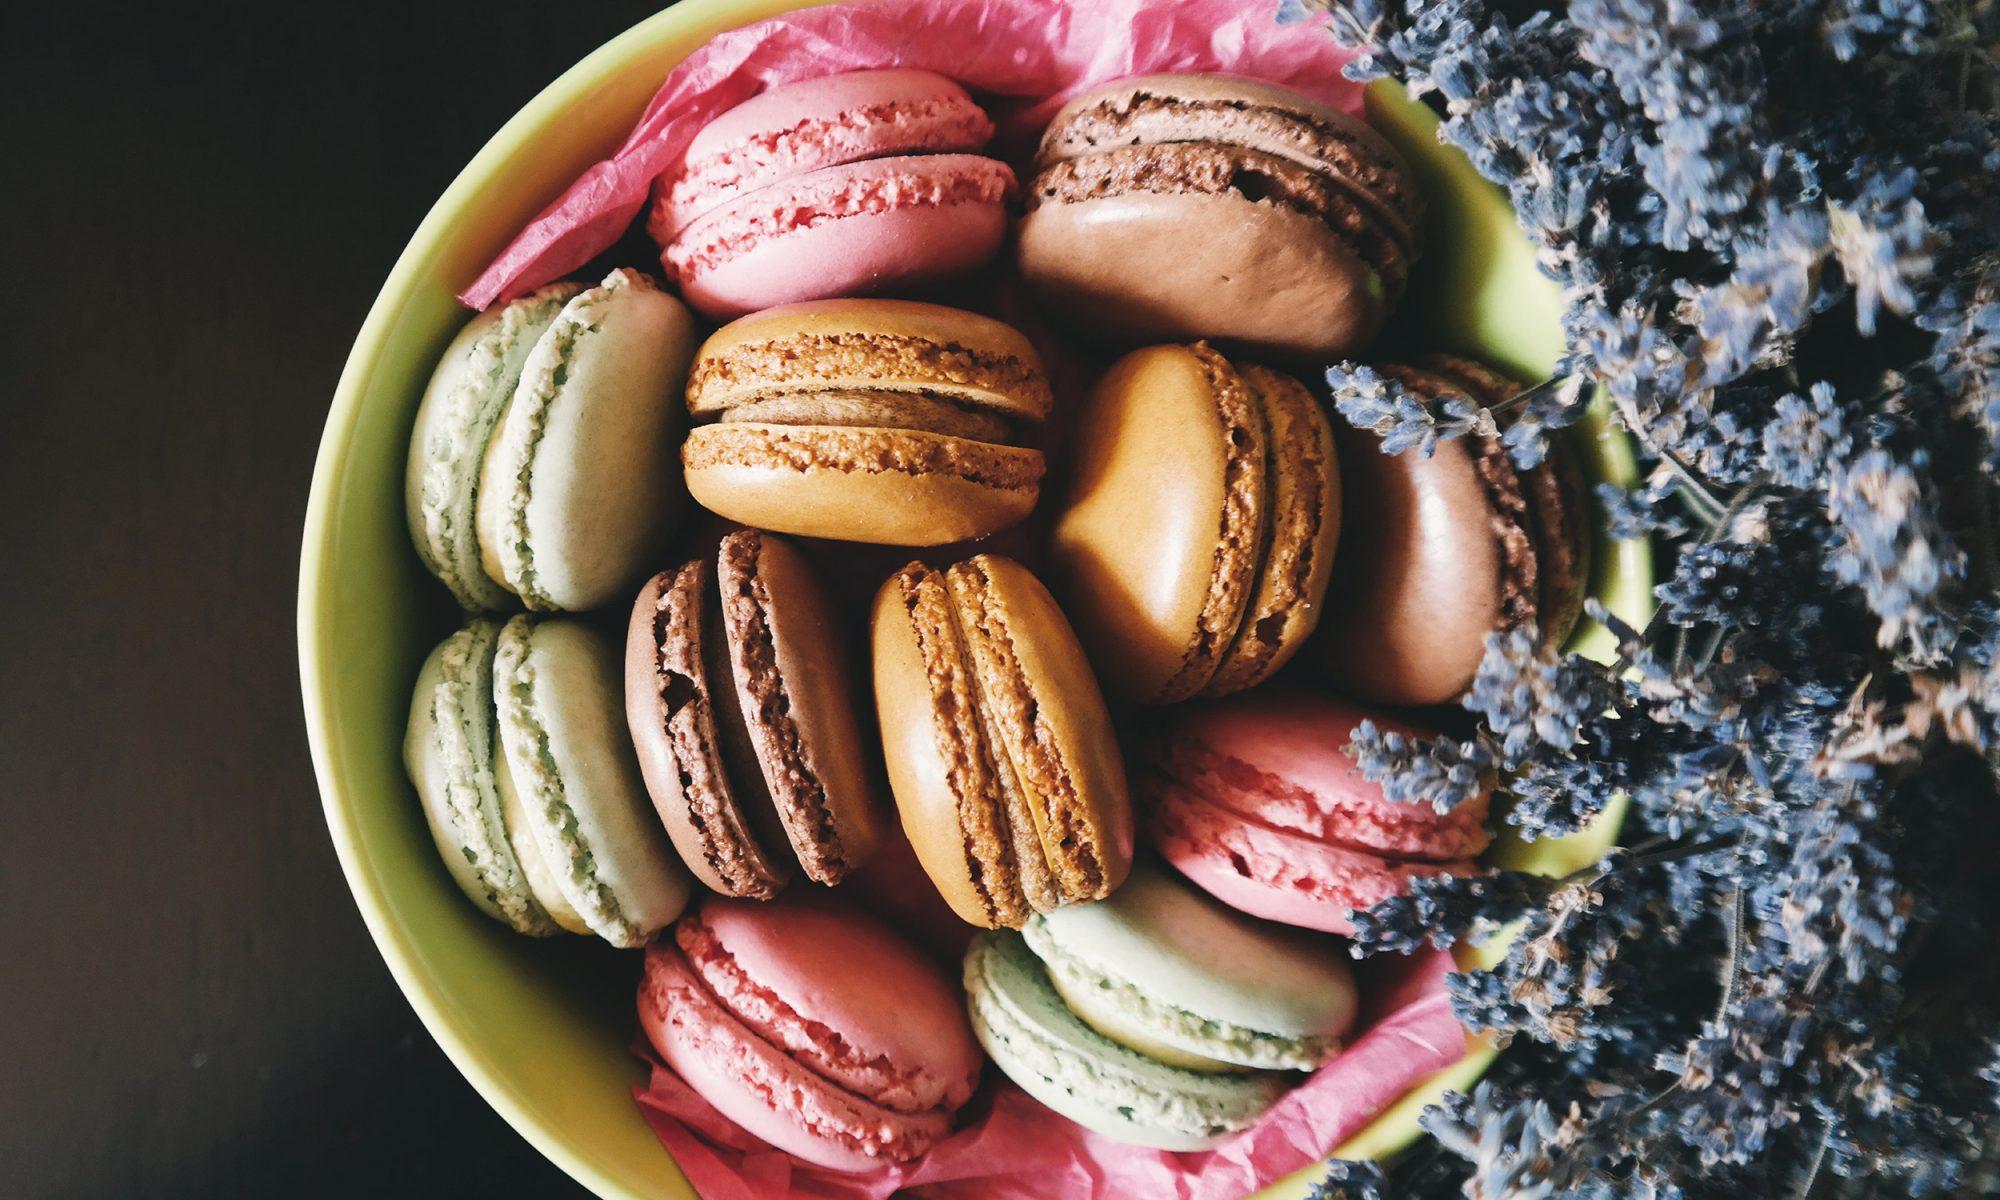 EC: These Macarons Taste Like Marina Abramović